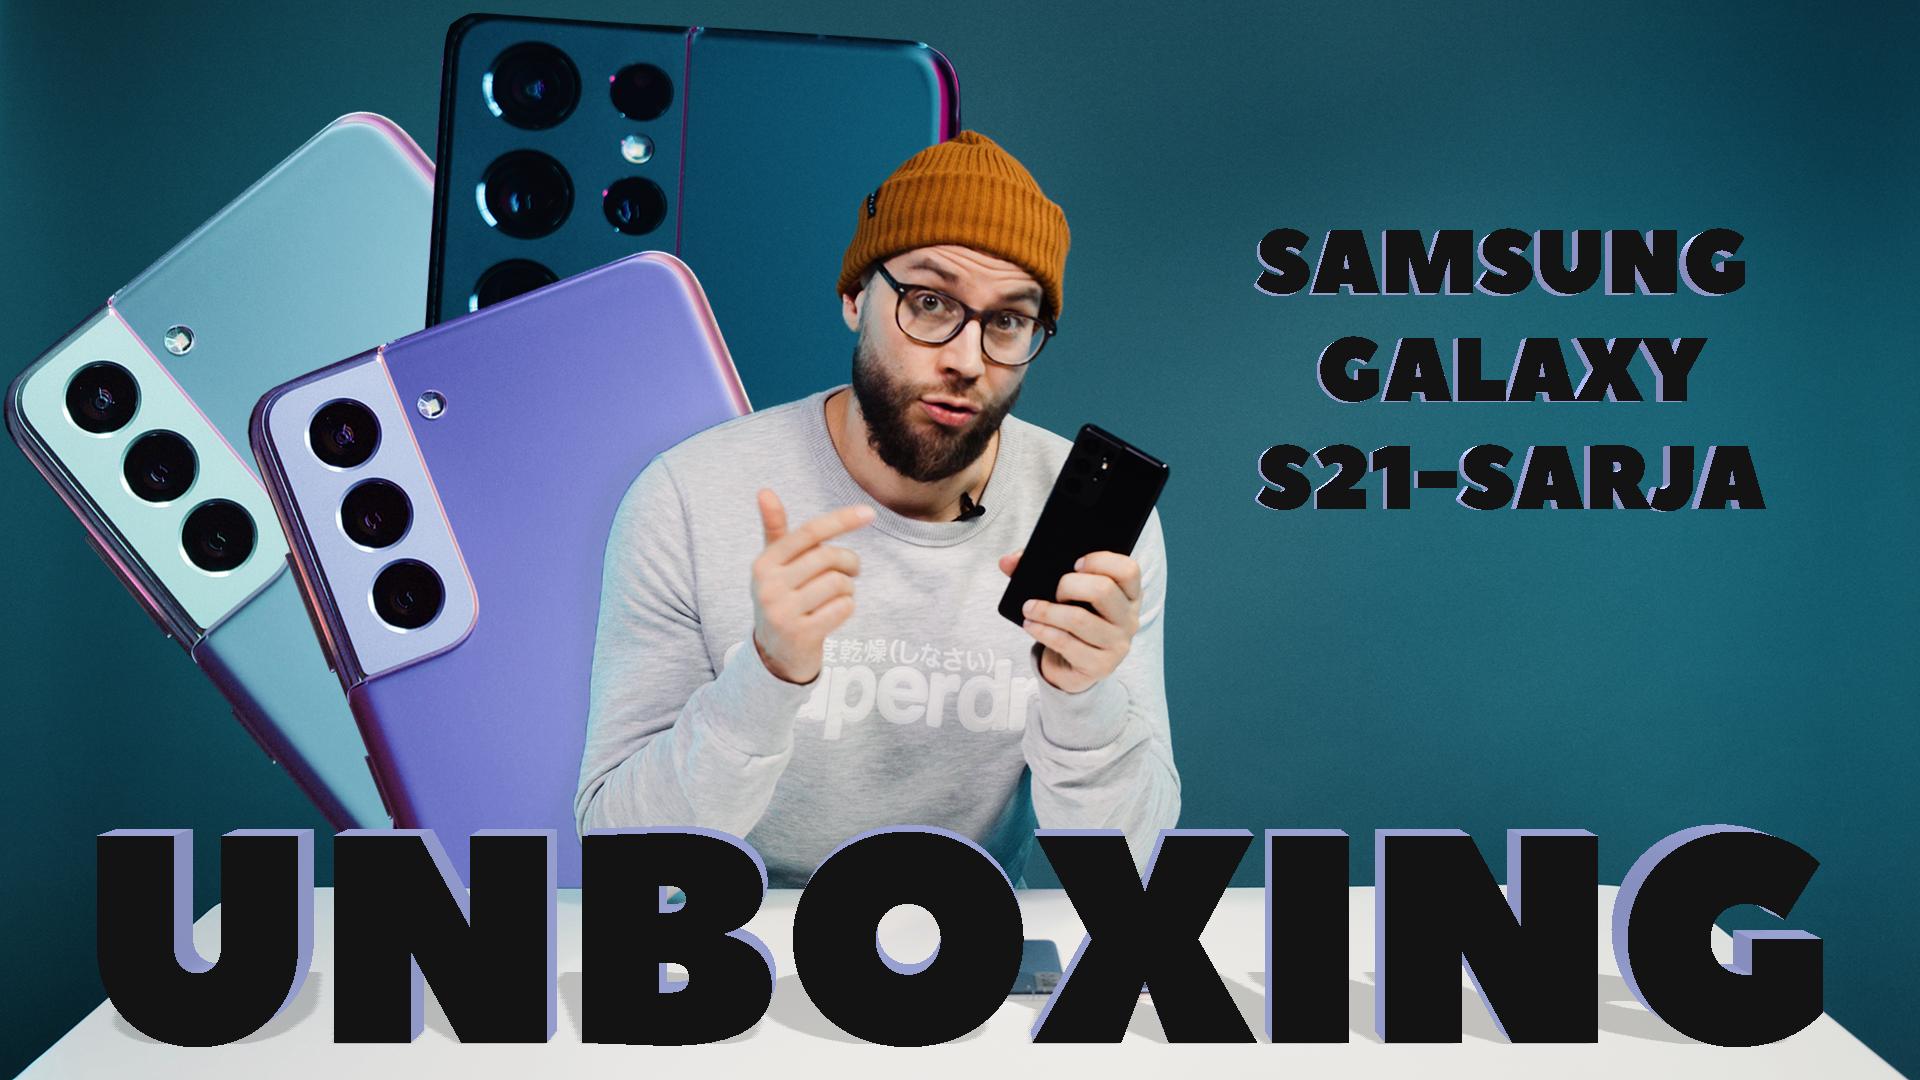 SamsungS21 Sarja UNBOXING